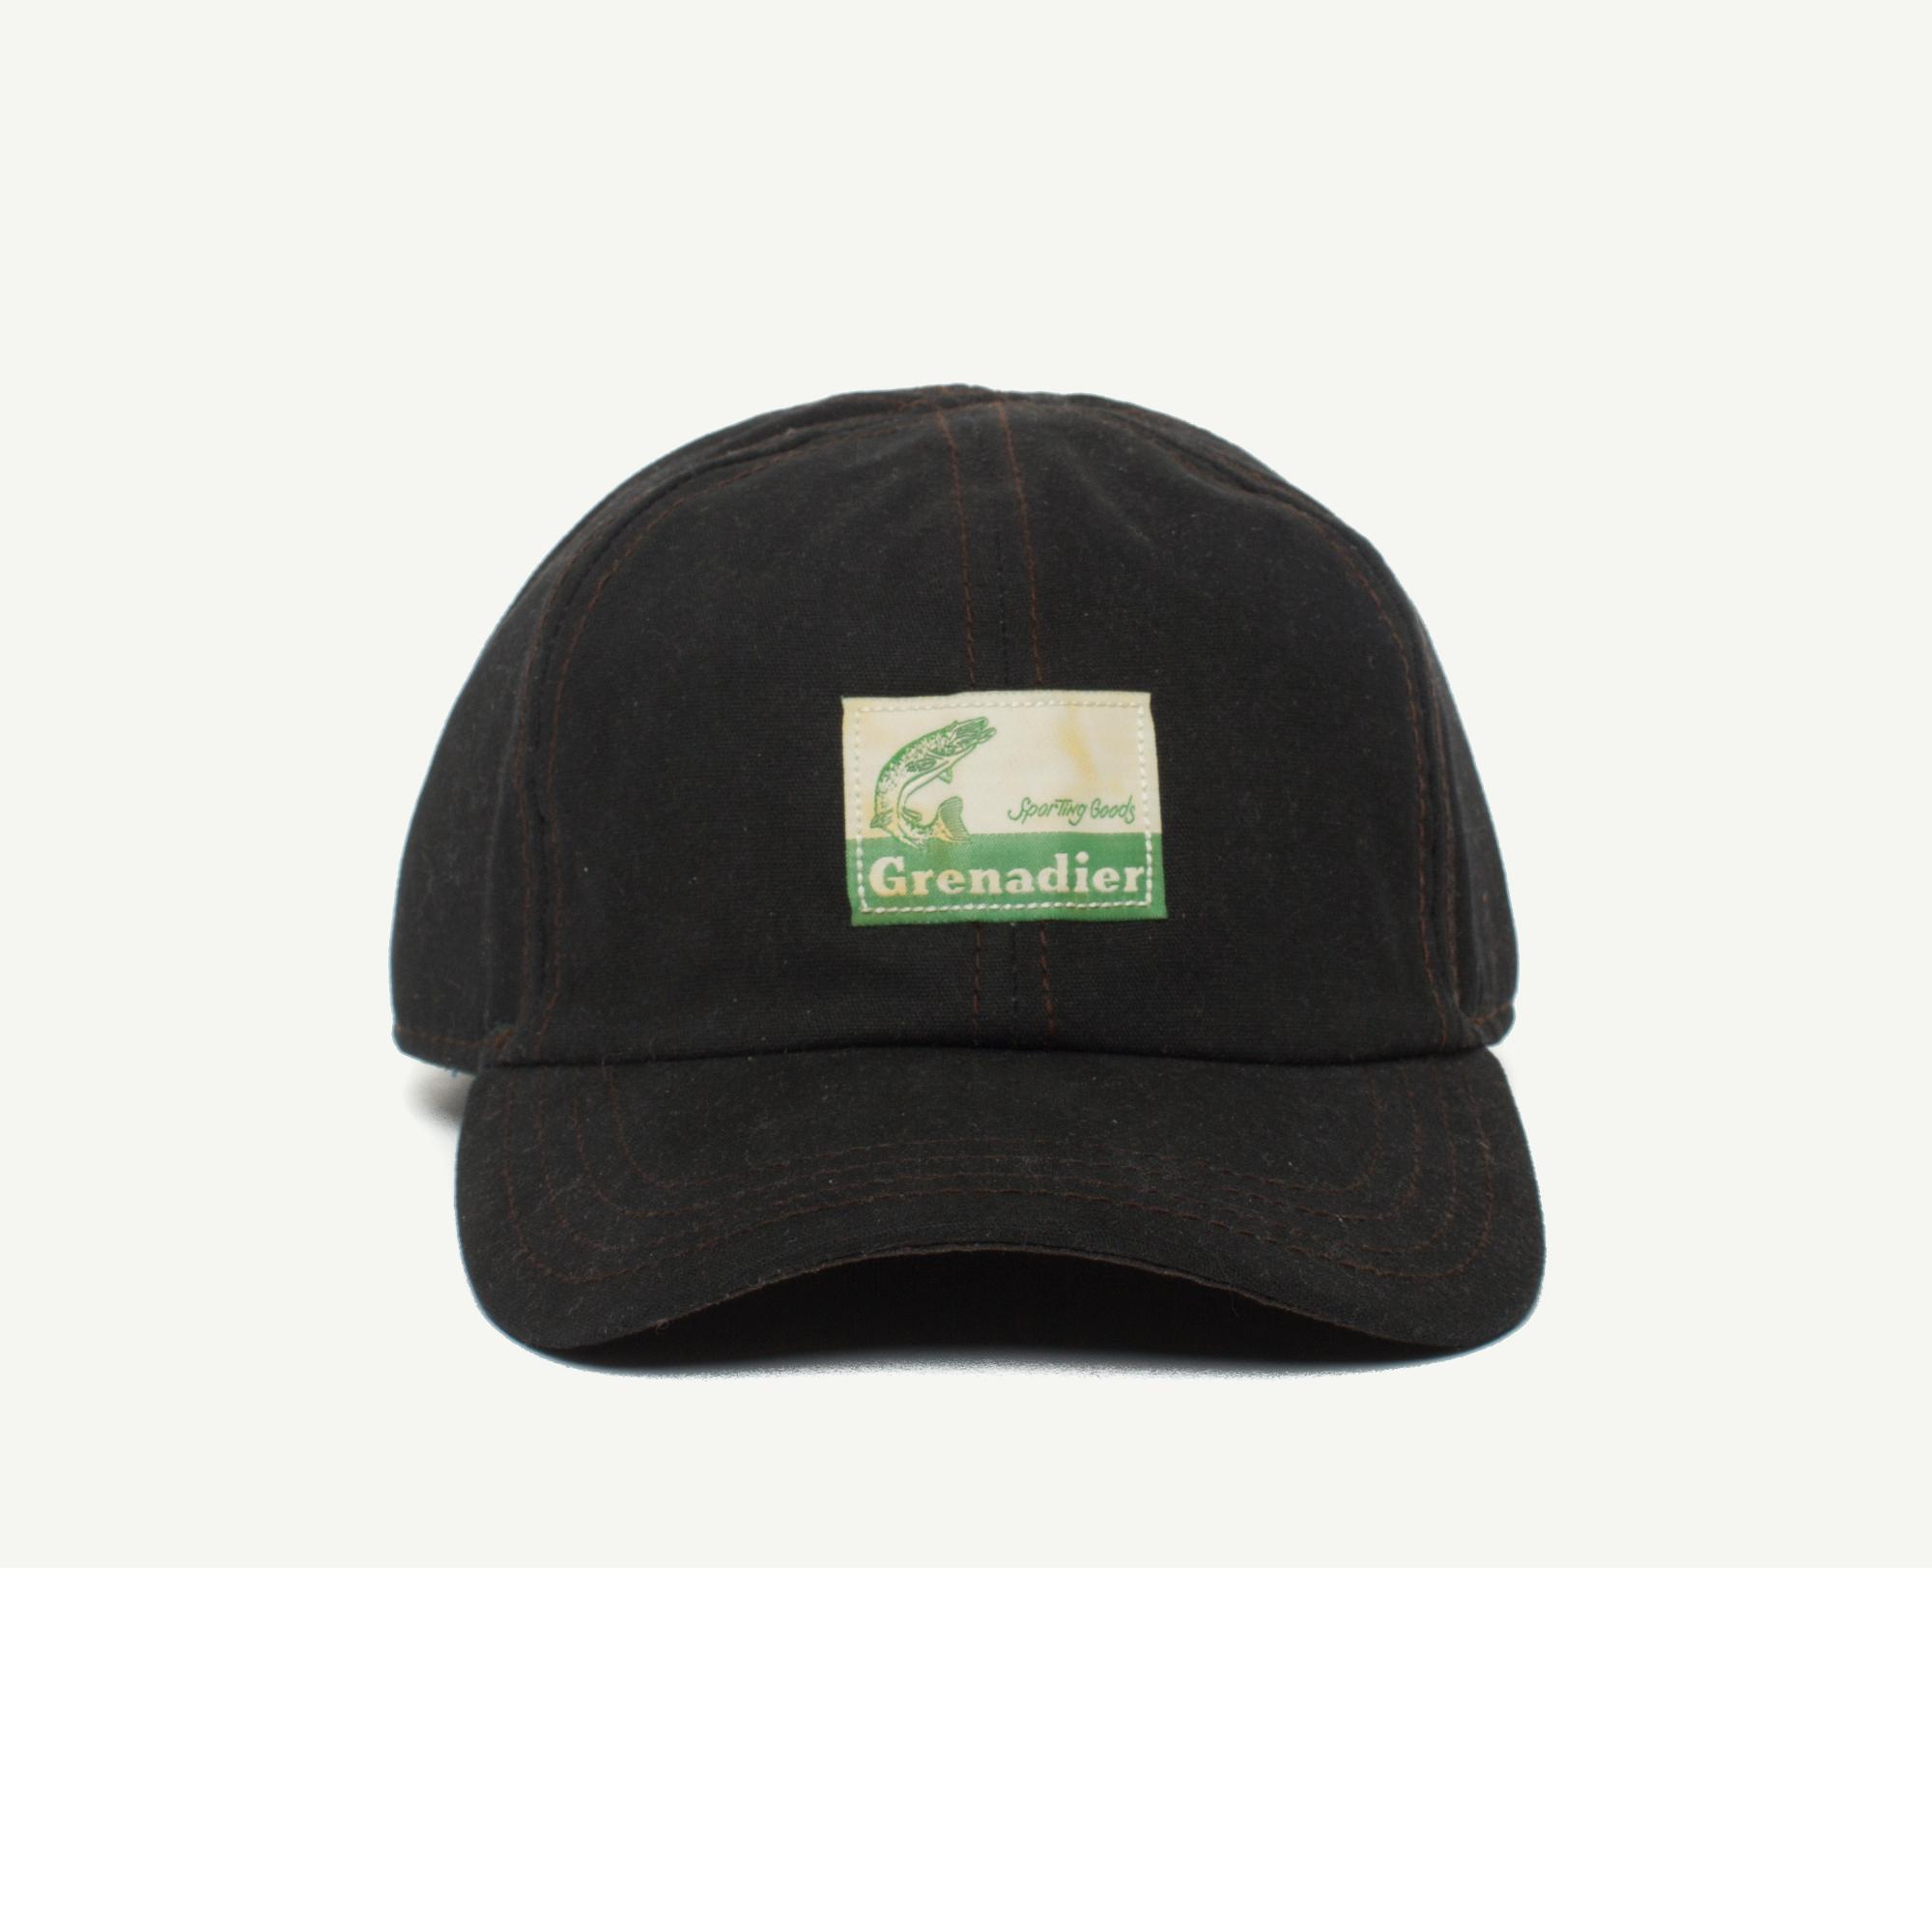 Sportfishing - B2C Catalog - Baseball Hat PNG Front